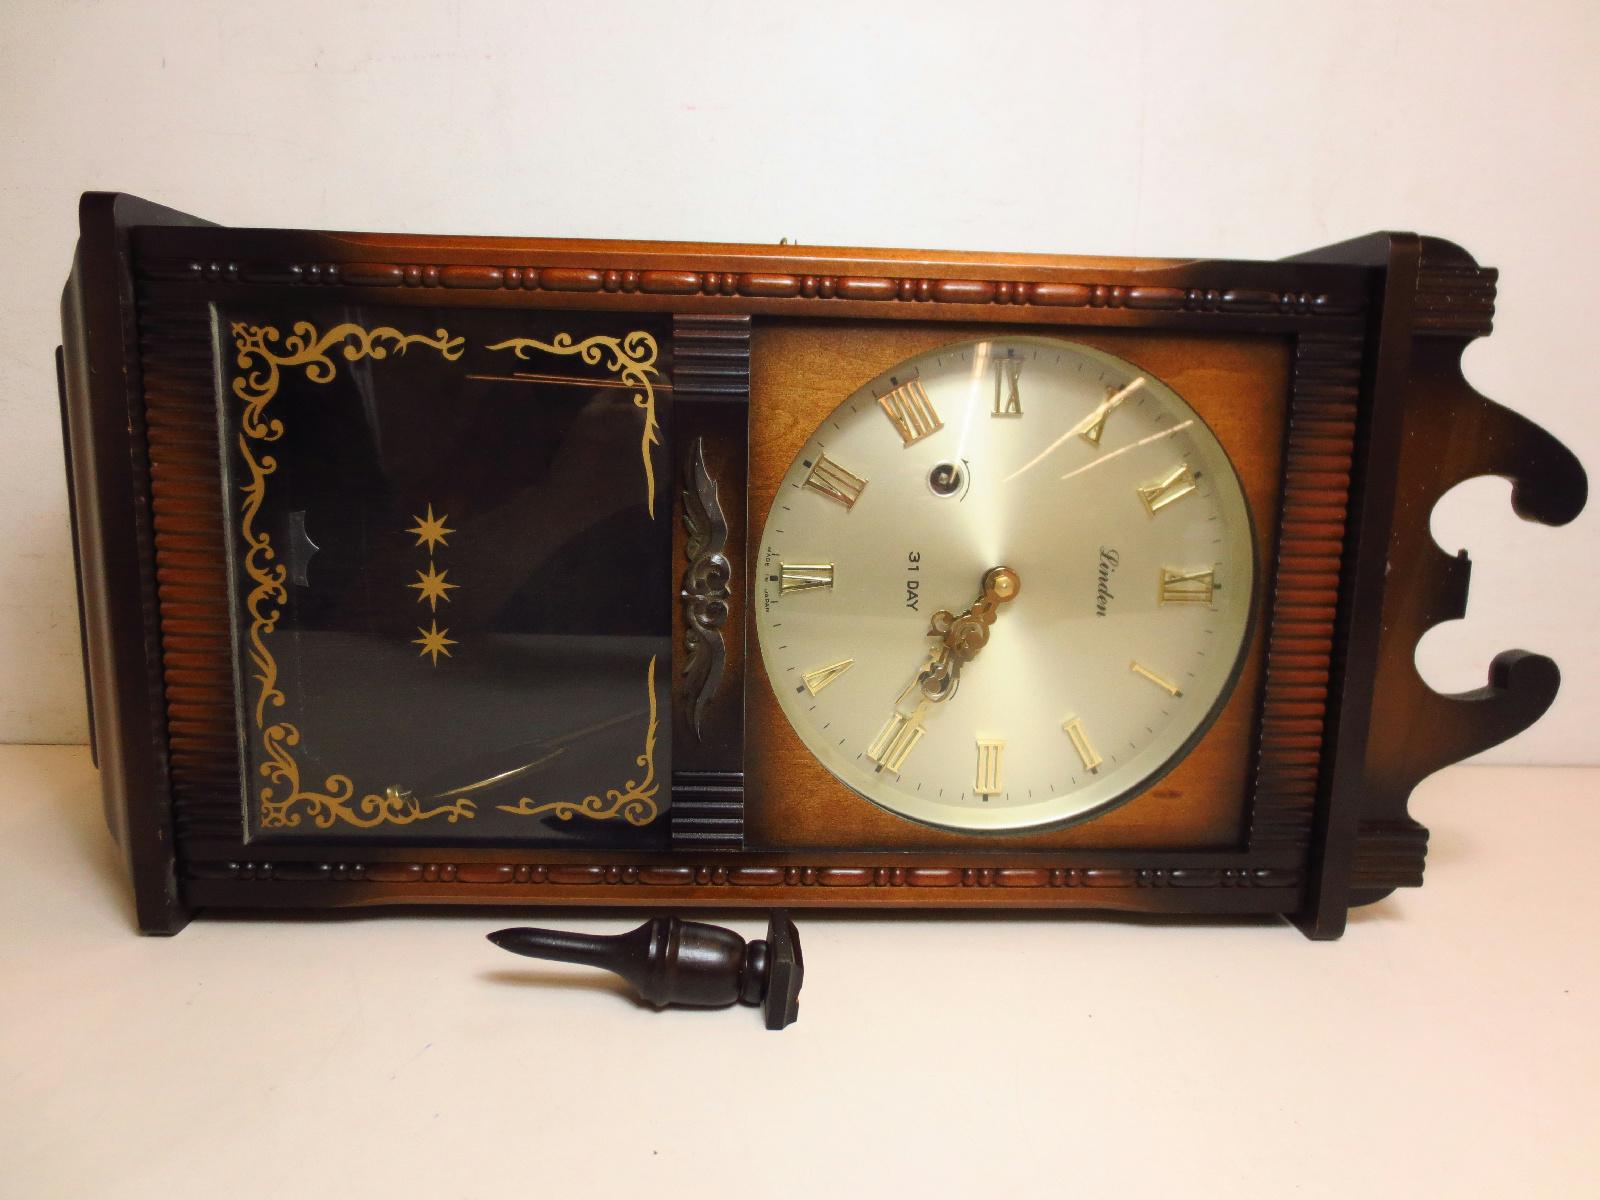 Vintage linden 31 day gong pendulum cuckoo clock wall clock for parts ebay - Cuckoo pendulum wall clock ...